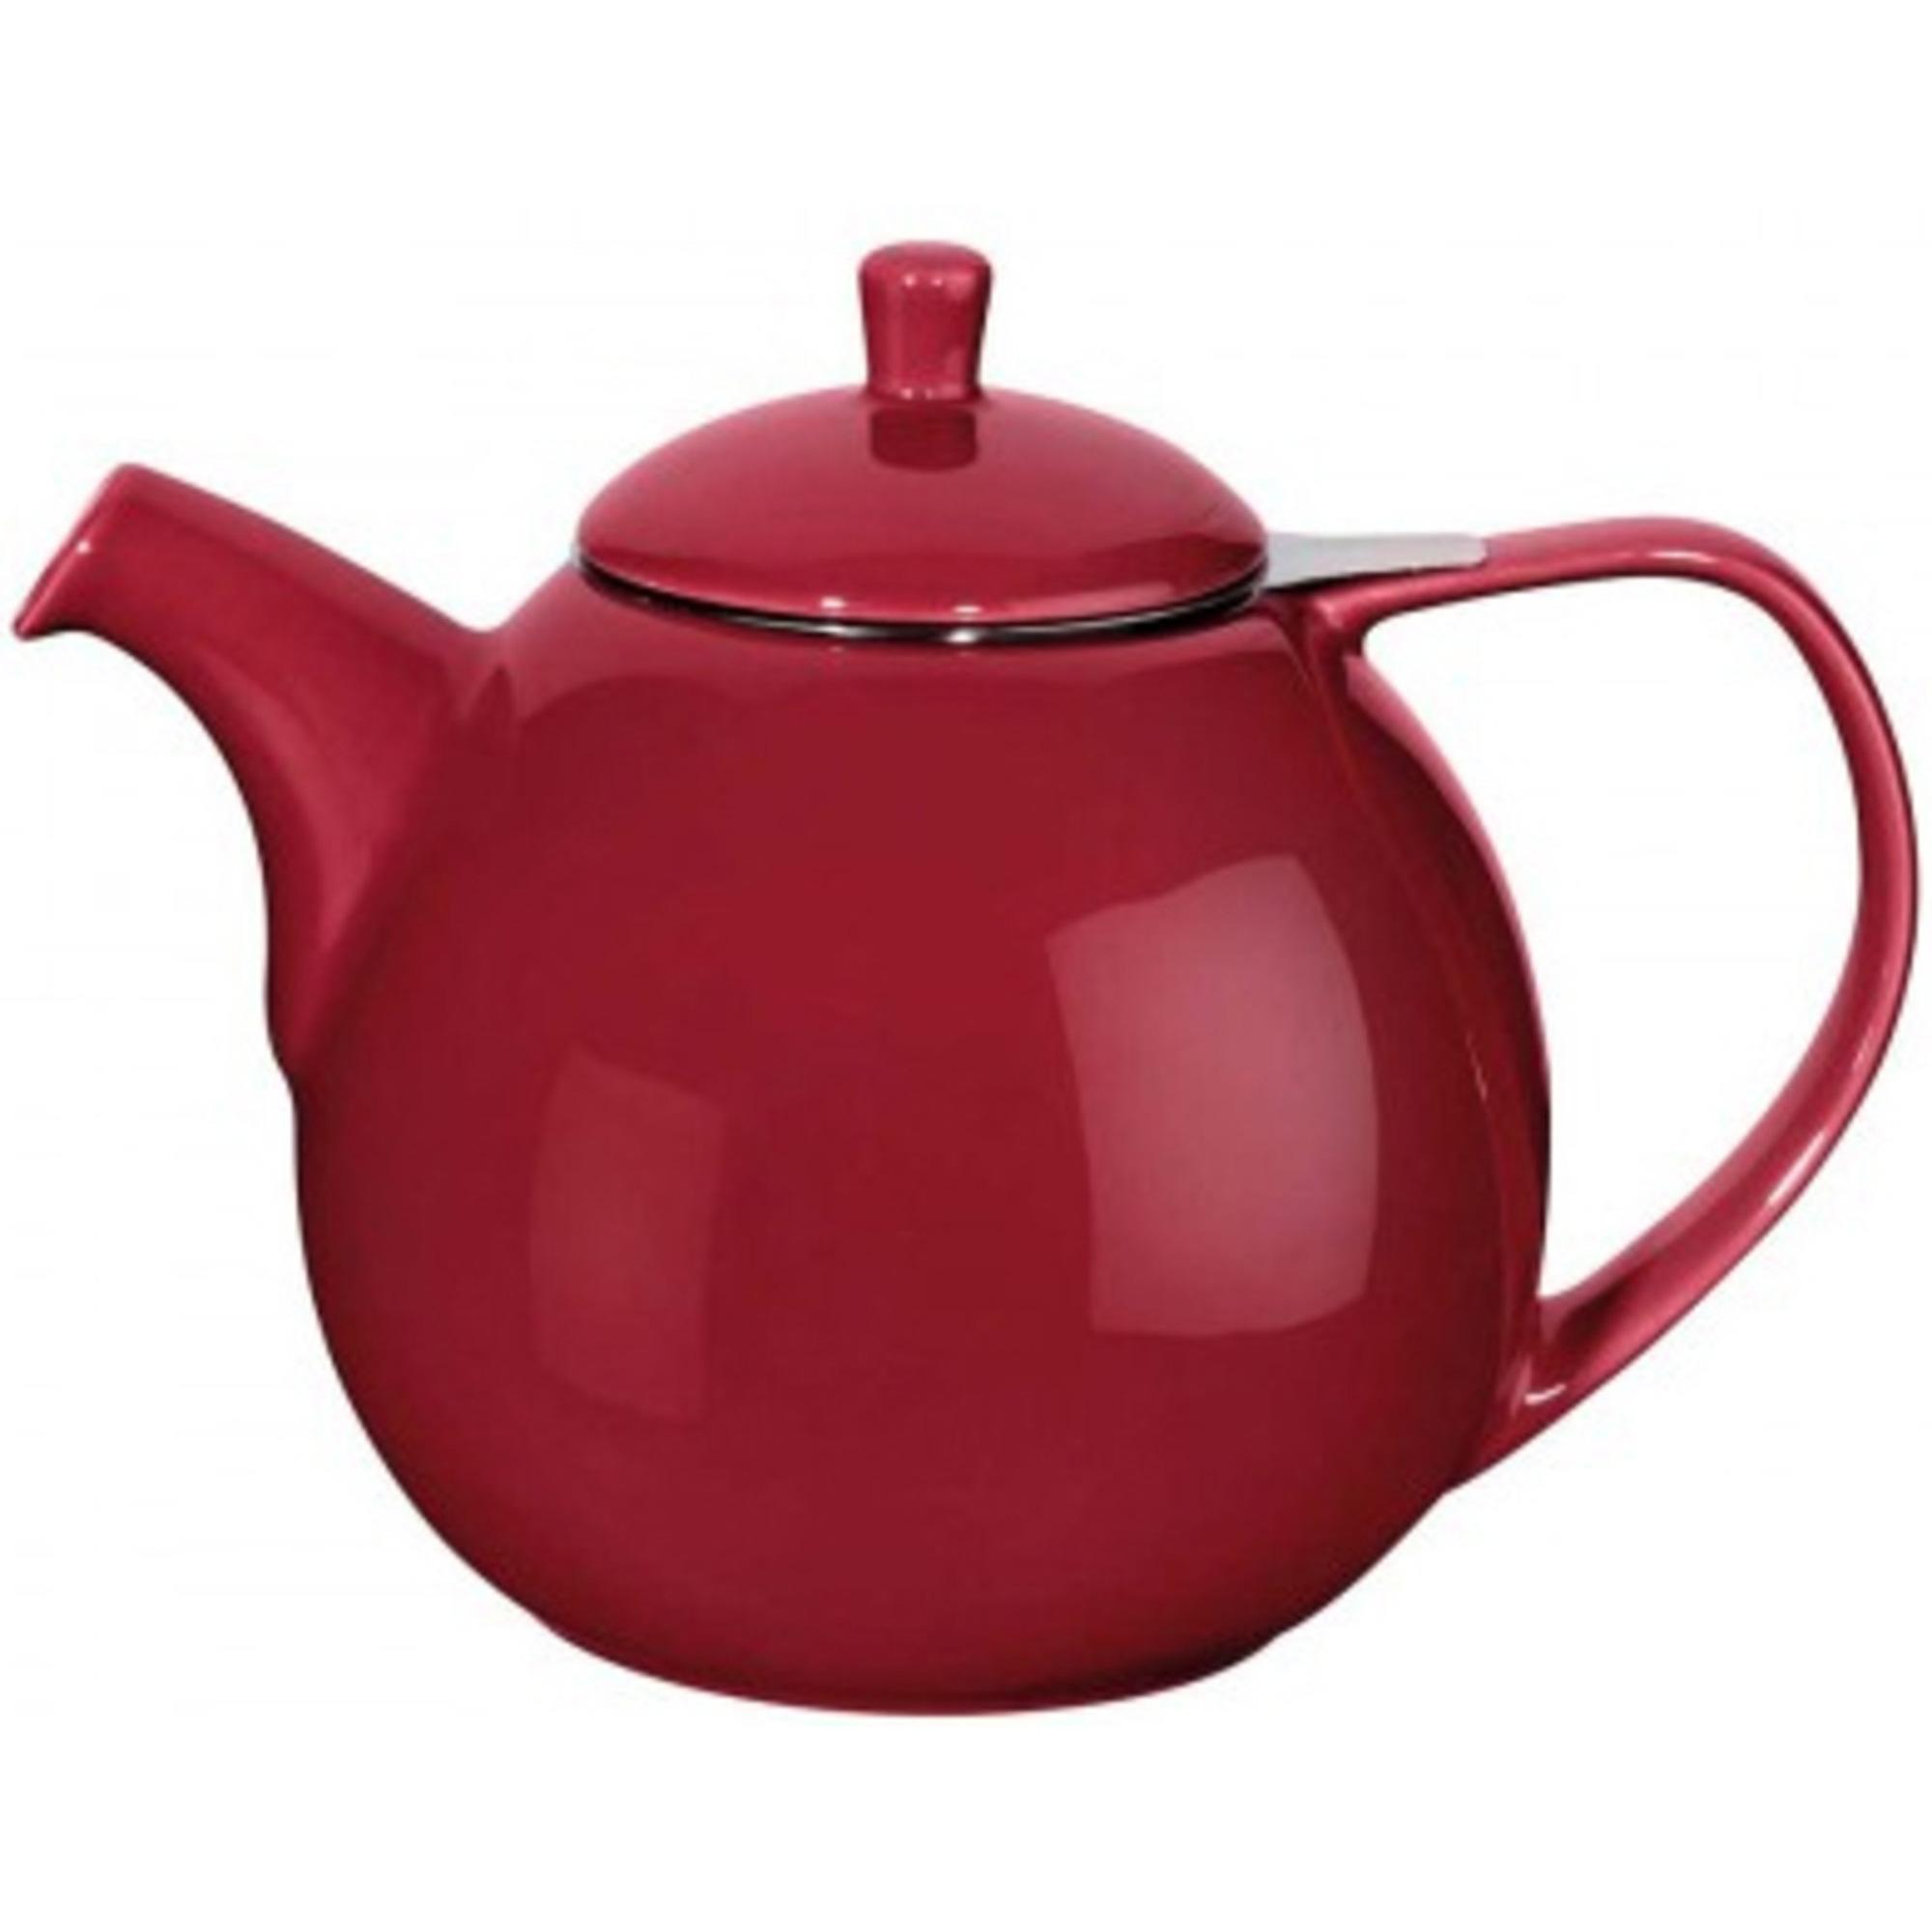 ForLife Curve Teapot 070 liter Bordeux